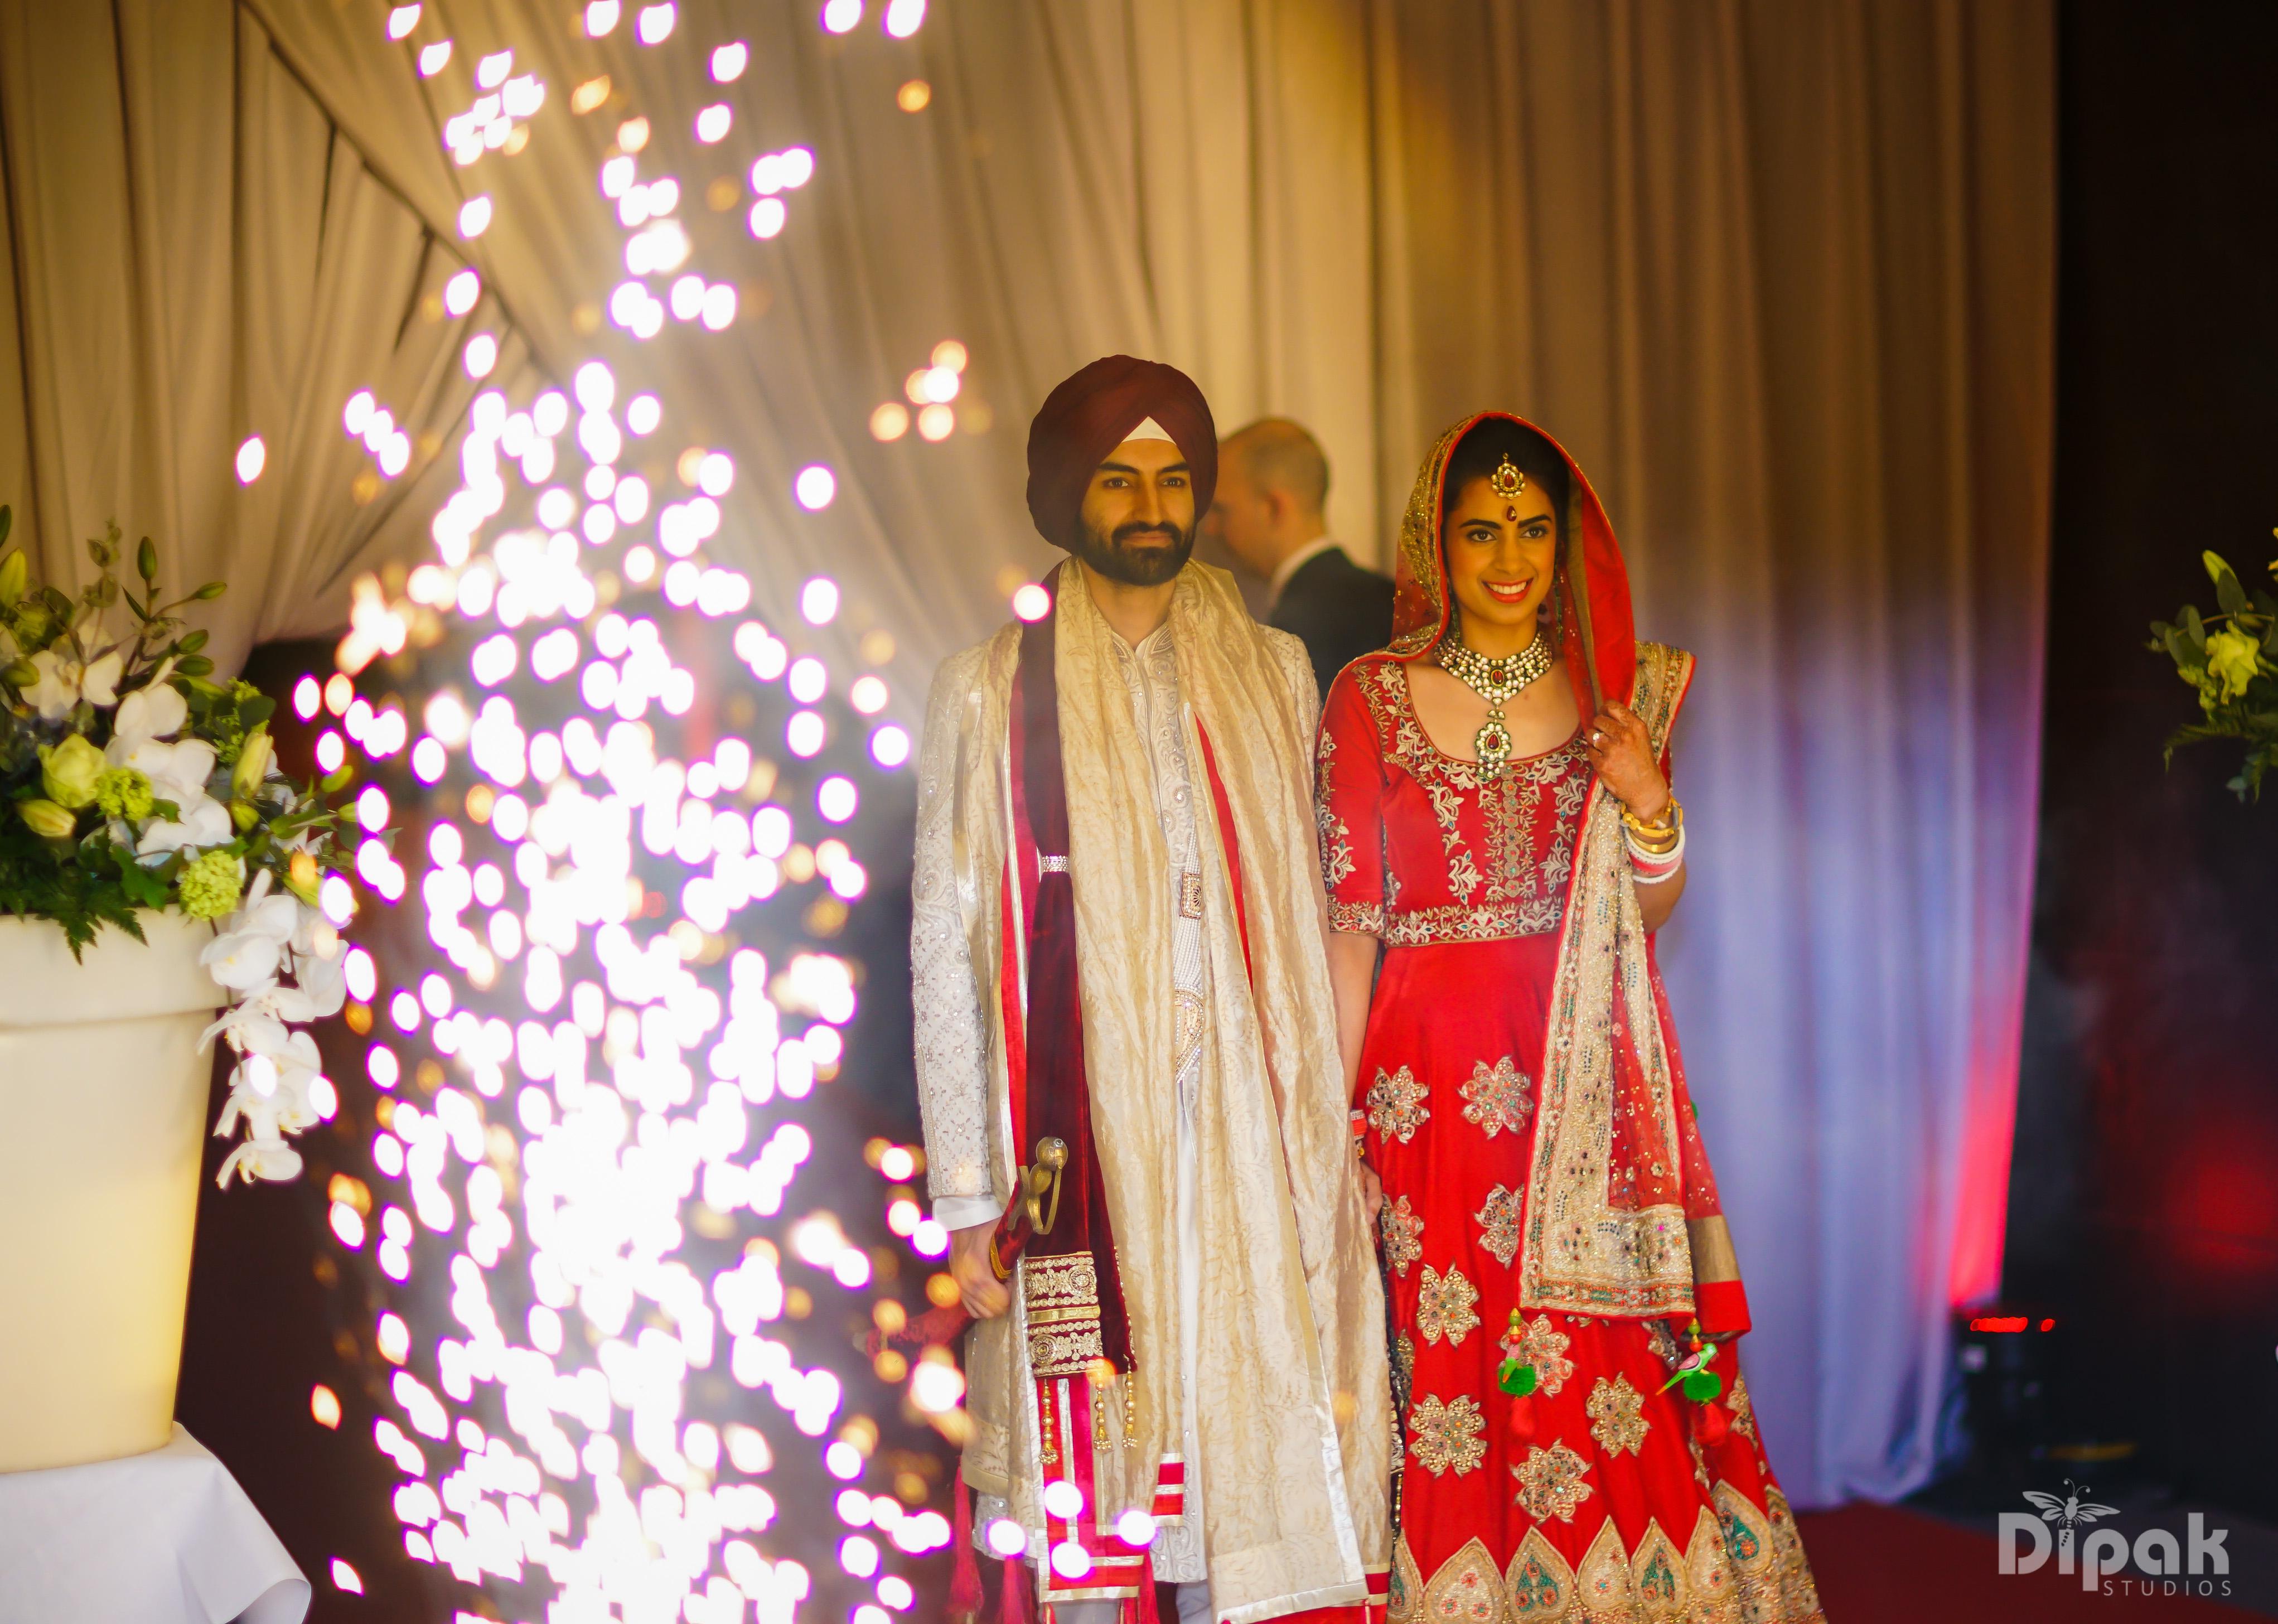 Ankita & Manmeet Fairytale Indian Wedding in Amsterdam - The Maharani Diaries